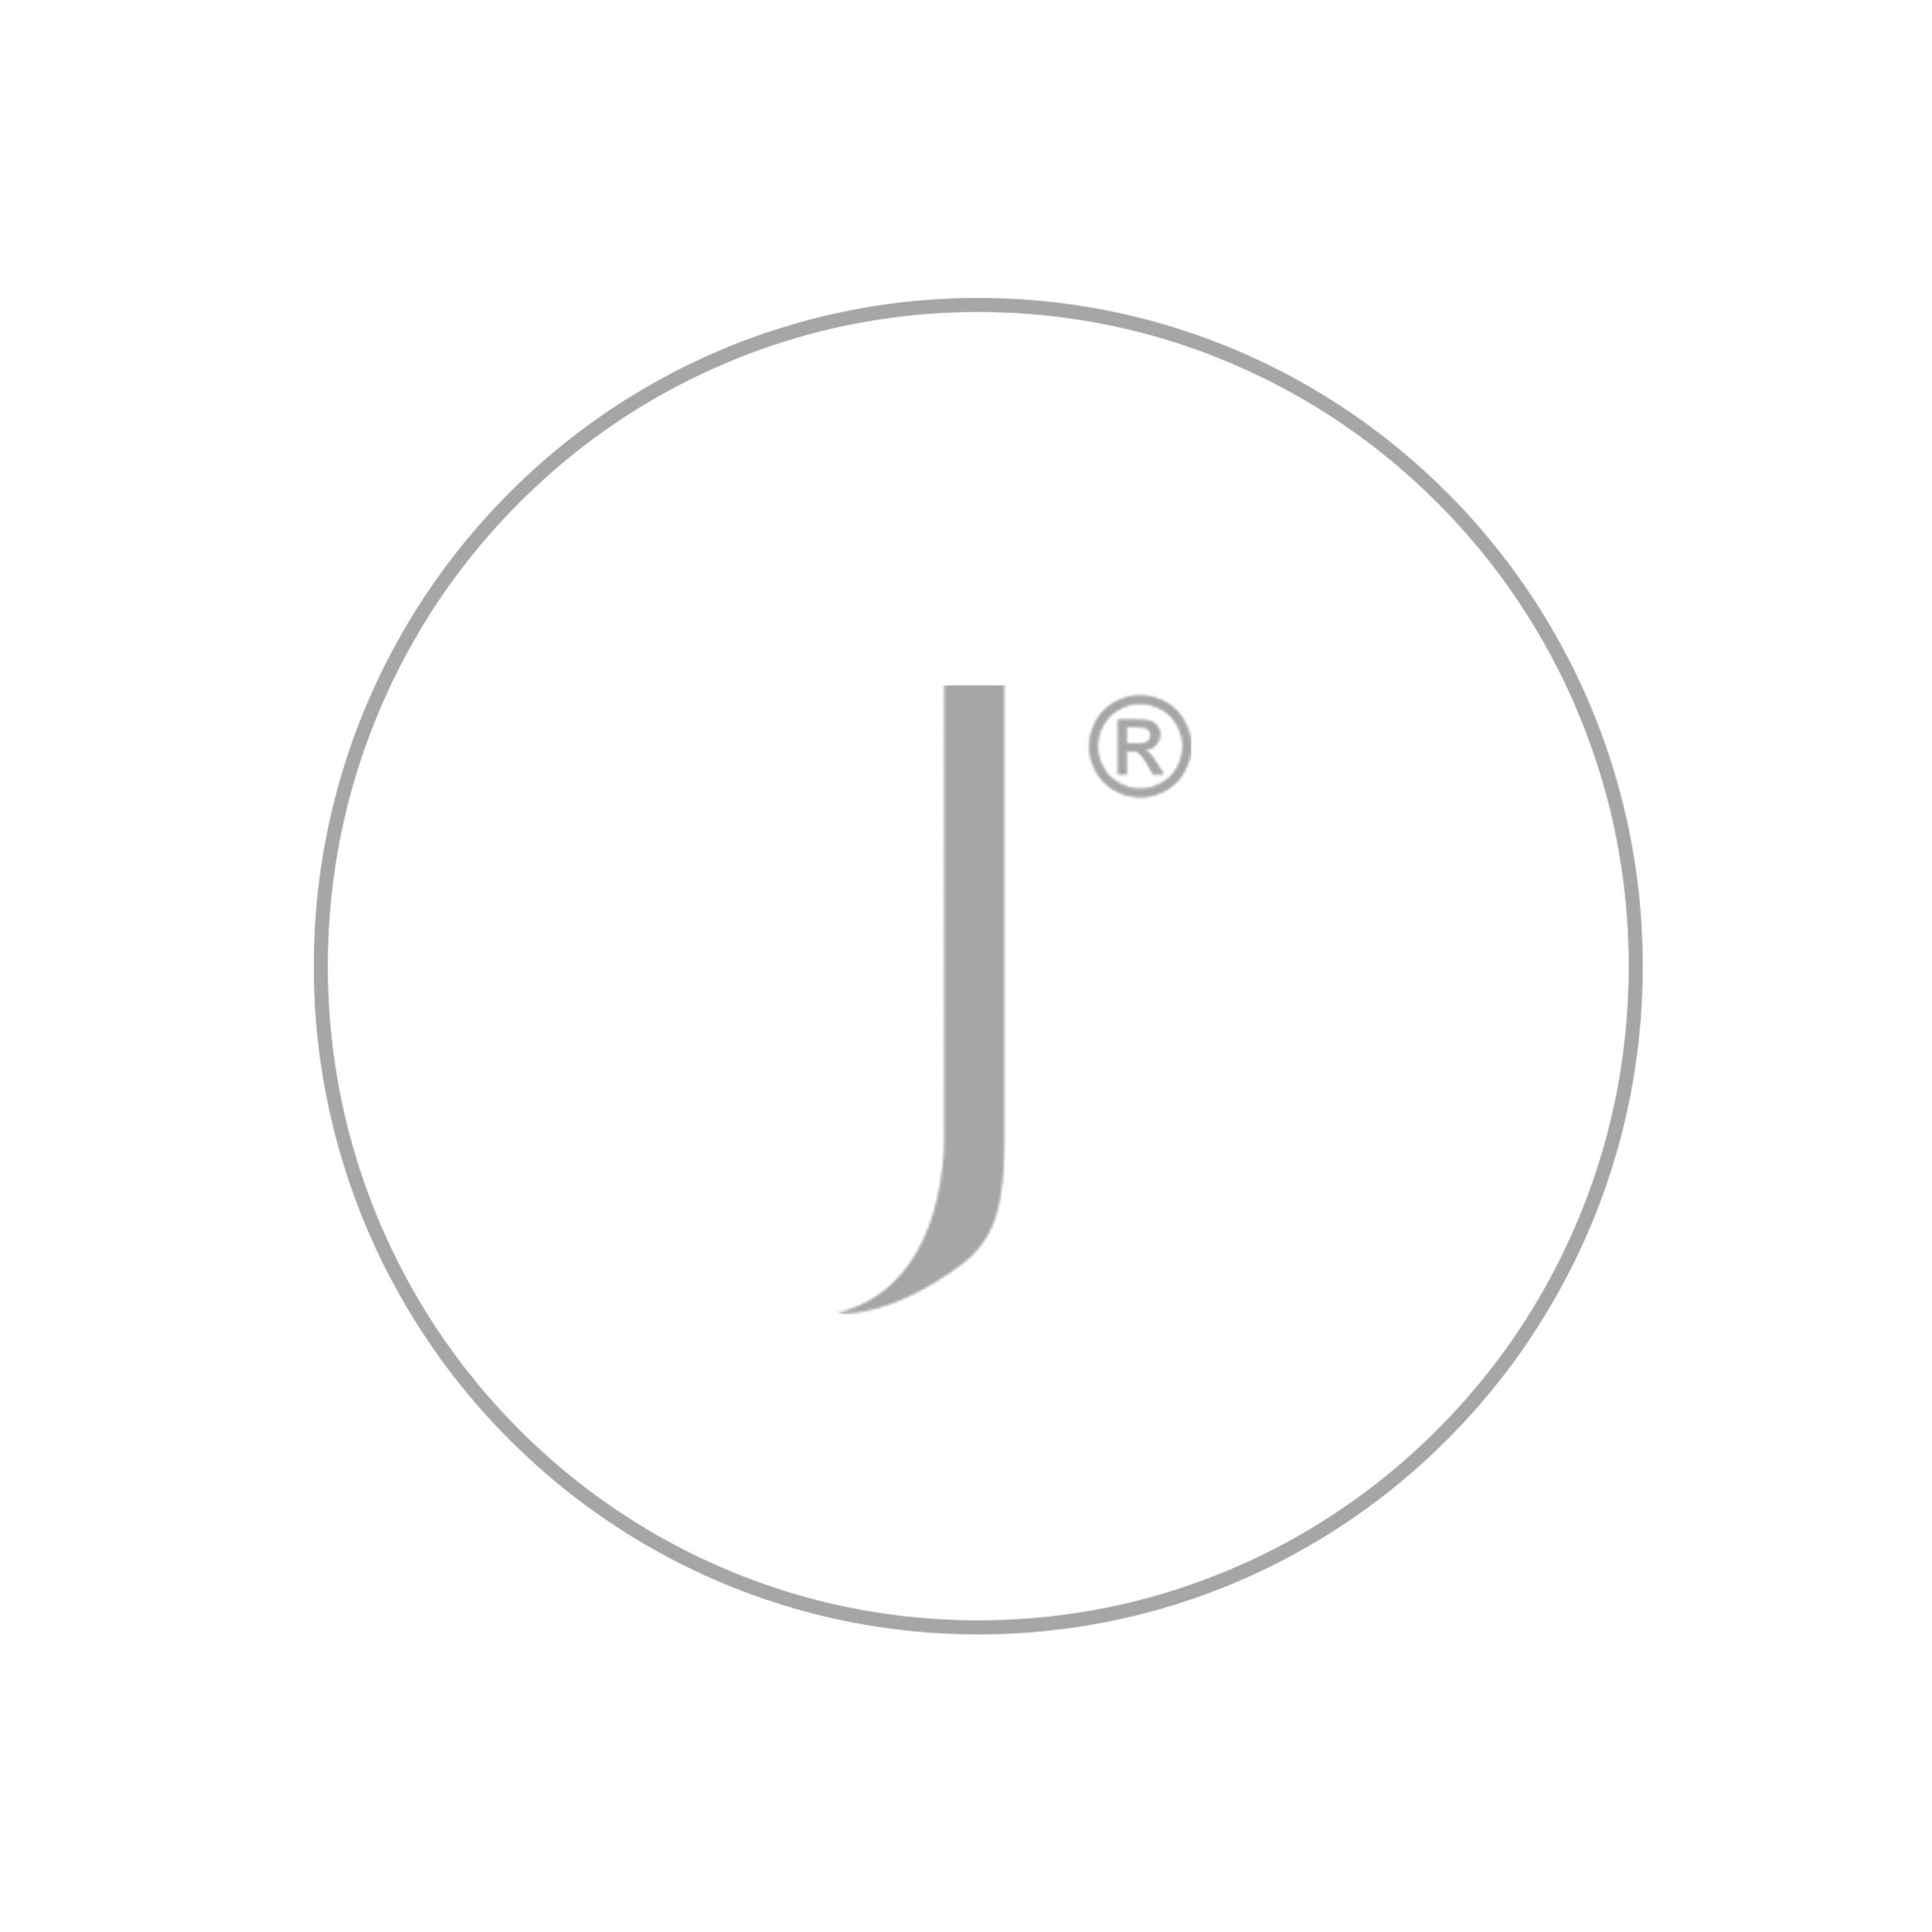 Sterling Silver & Diamond Hug Bear Ring | Ileava Jewelry